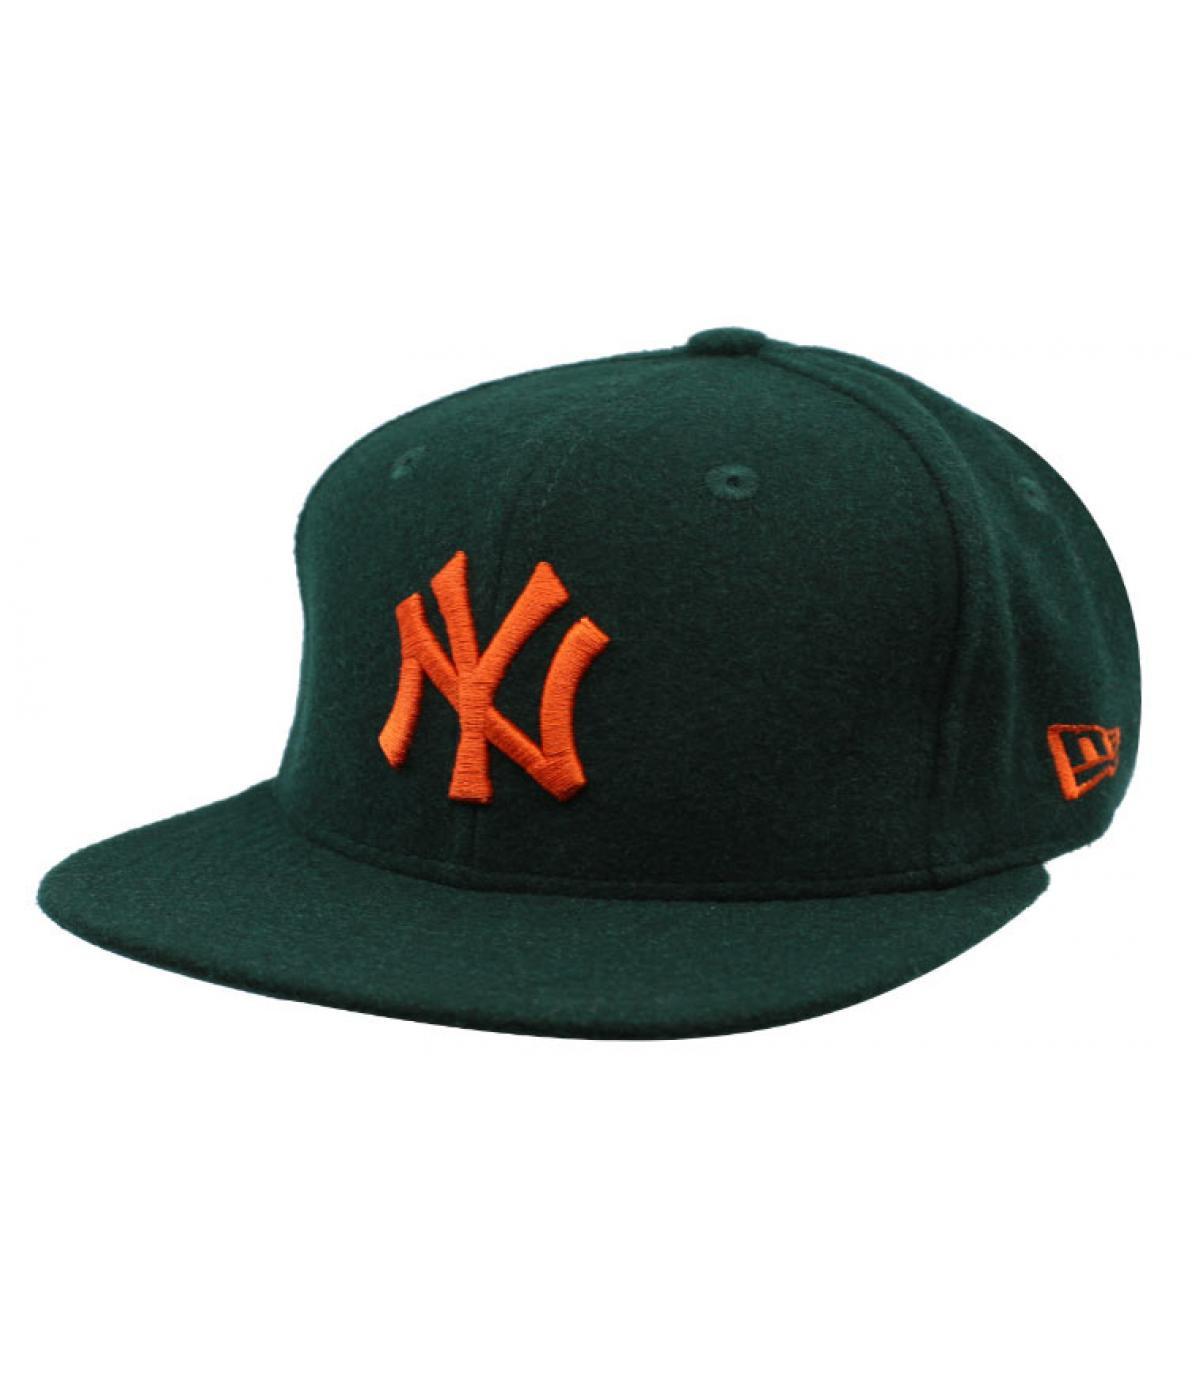 Détails Snapback Winter Utility NY Melton 9Fifty dark green orange - image 2